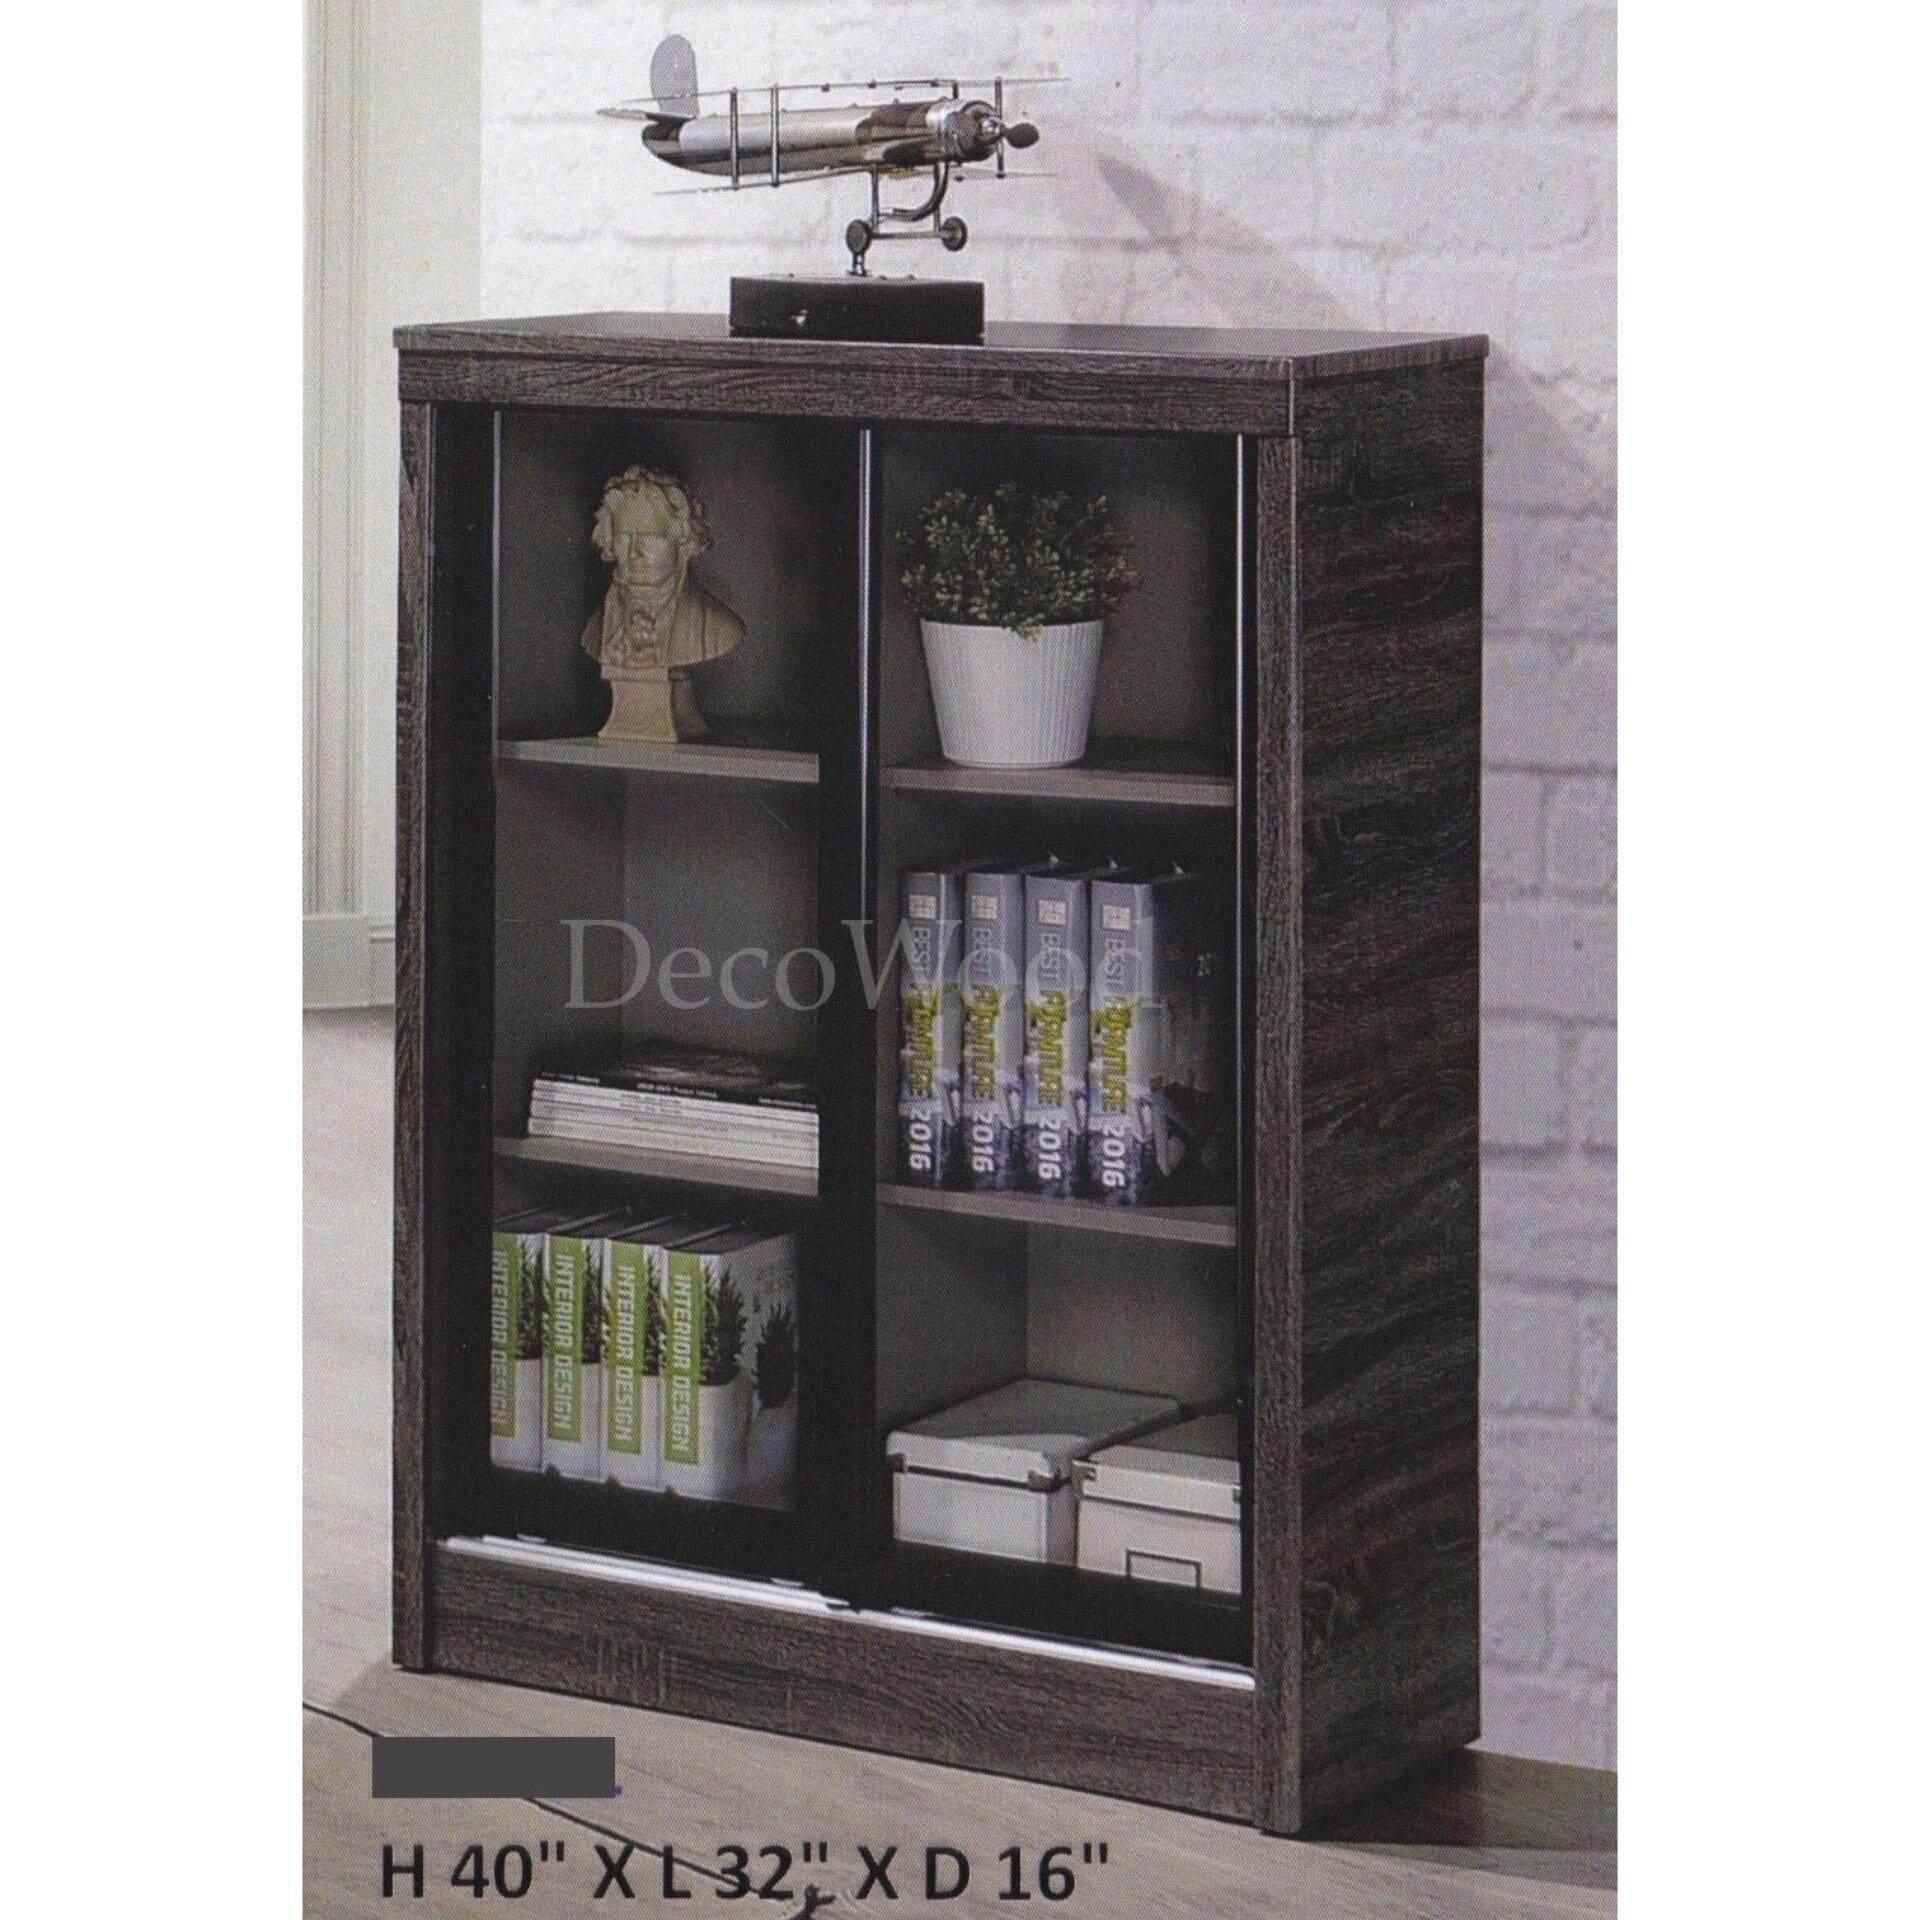 Ready-Fixed 2 & Half Feet Sliding Glass Door Book Case Book Shelf Book Cabinet Multi-Purpose Display Cabinet Storage Cabinet (Dark Grey Colour) L813MM X W410MM X H1020MM Pre Order 1 Week